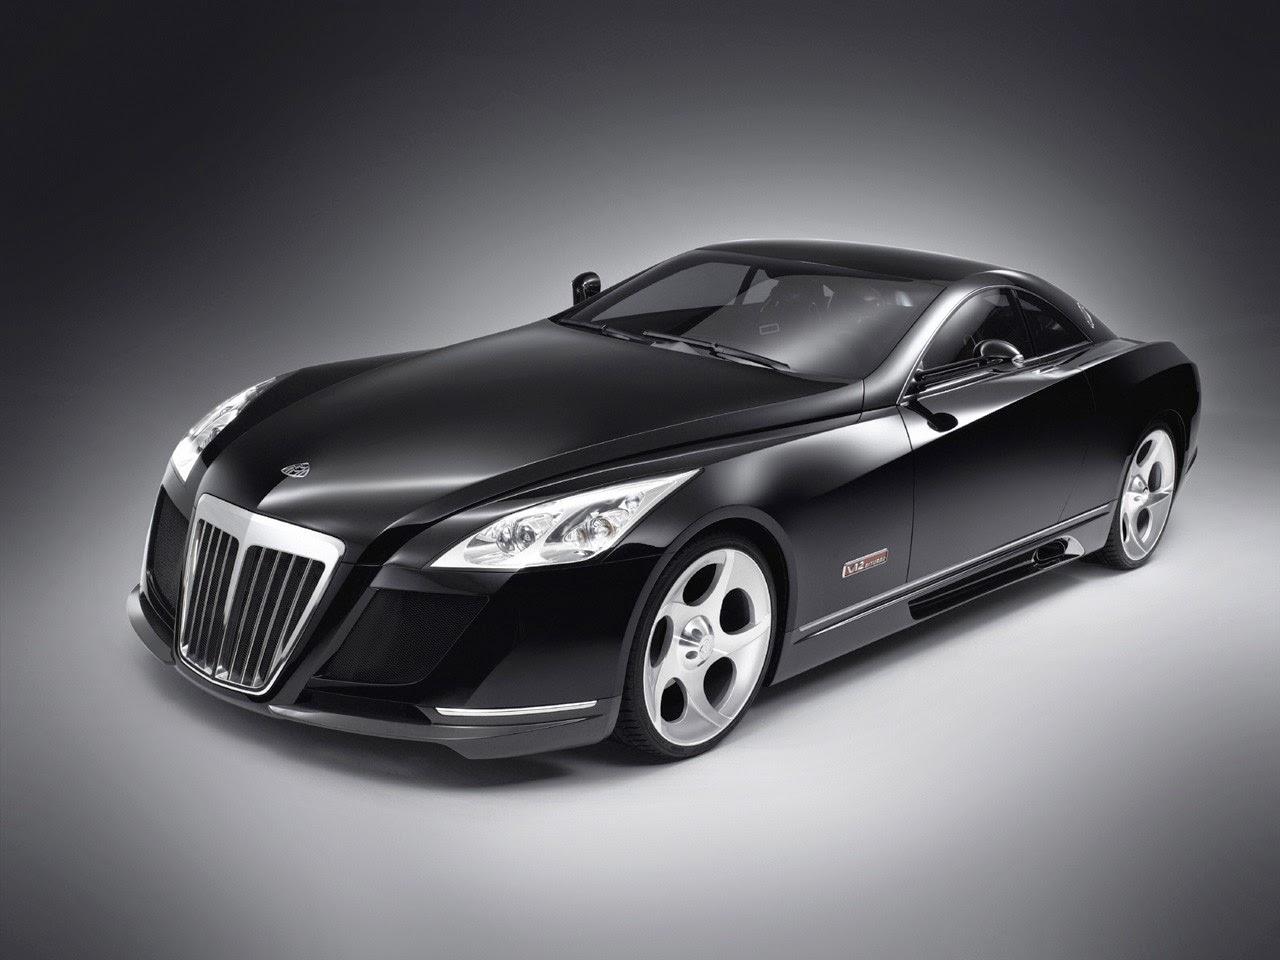 "<img src=""http://2.bp.blogspot.com/-LRzn_0wuGag/U5Si6d9MWeI/AAAAAAAAALU/ICMmOa7O17E/s1600/may_exel.jpg"" alt=""Most Expensive Cars in the World"" />"